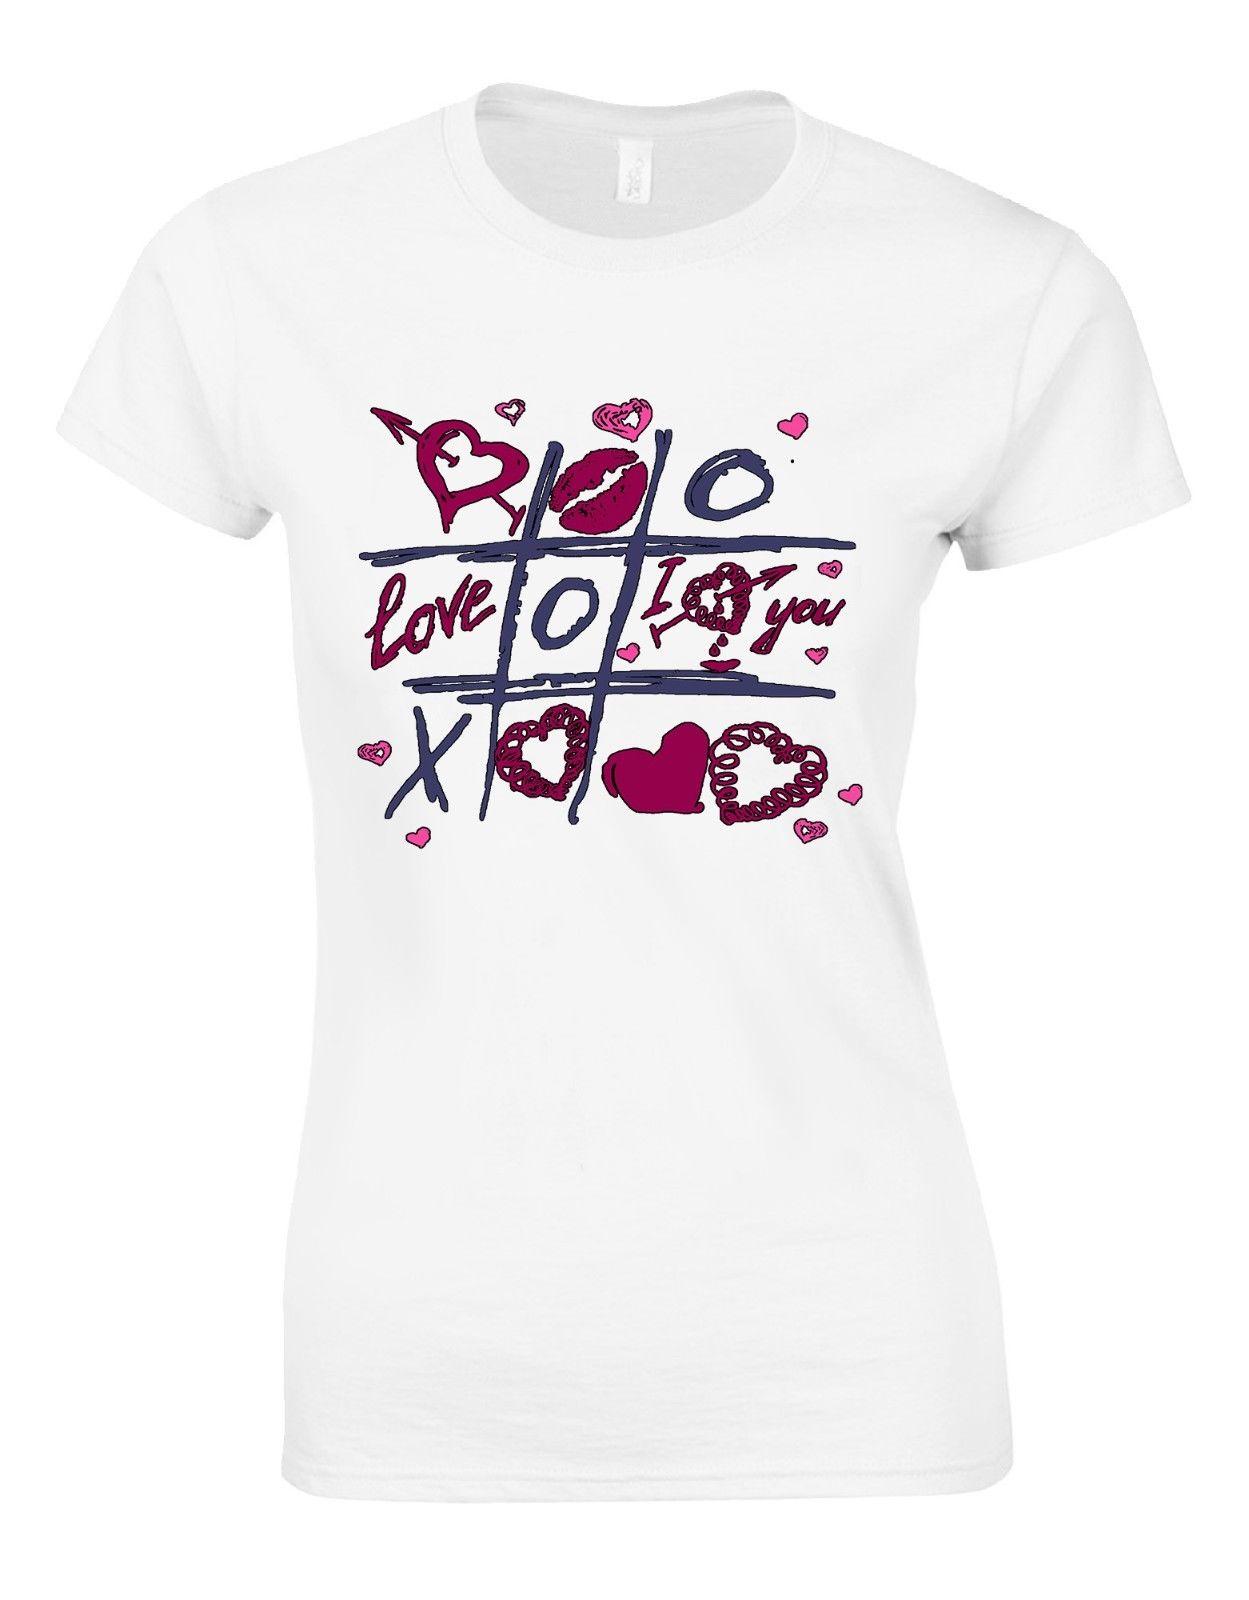 Womens Fashion T shirt Tic Tac Toe Hearts I Love You Funny Valentines February 14 Woman T shirt AM33